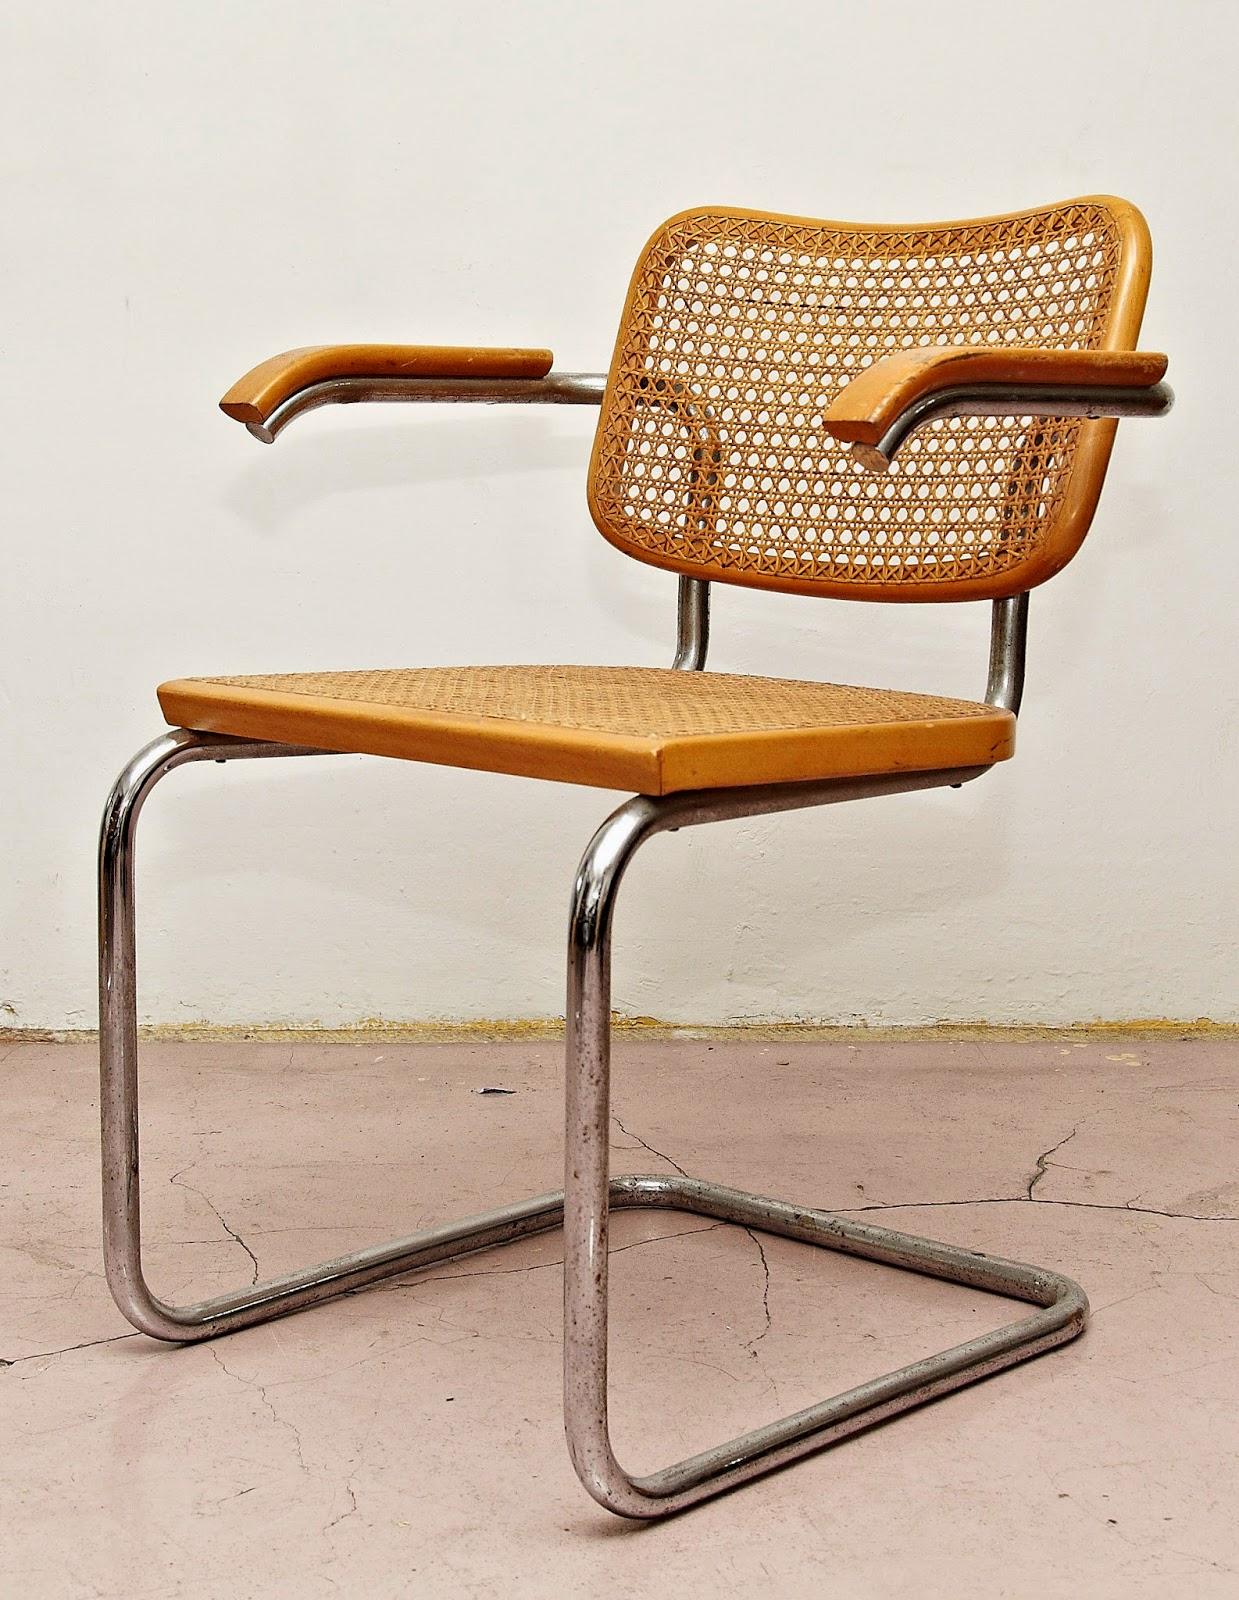 ourso designs marcel breuer cesca chair 1928. Black Bedroom Furniture Sets. Home Design Ideas